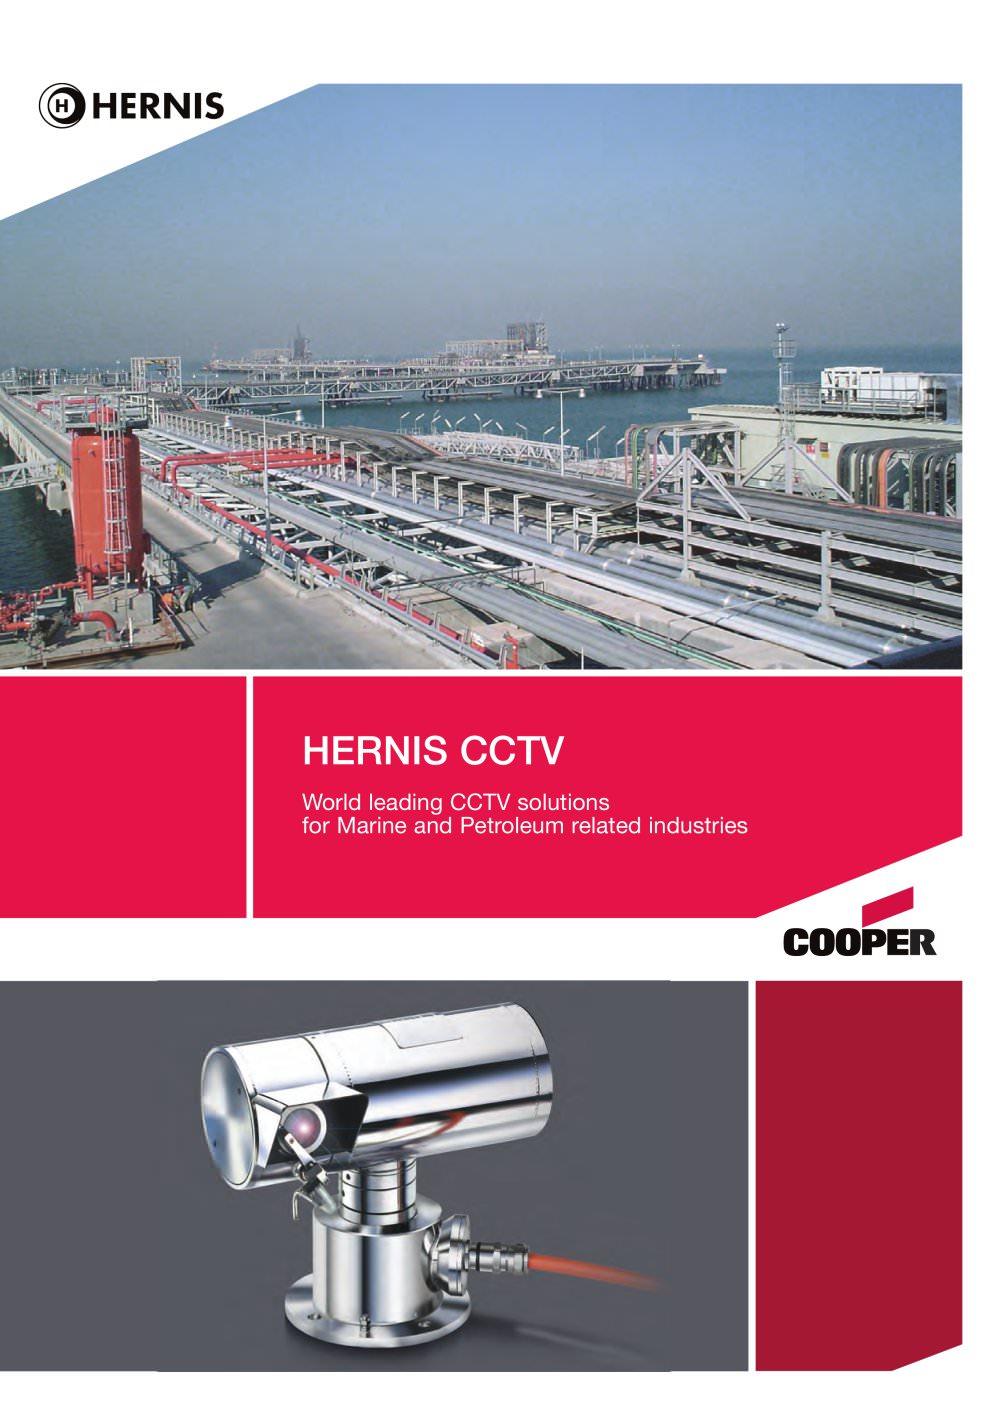 Cctv Camera Wiring Diagram Pdf Installation Hernis Scan Systems Catalogs Documentation